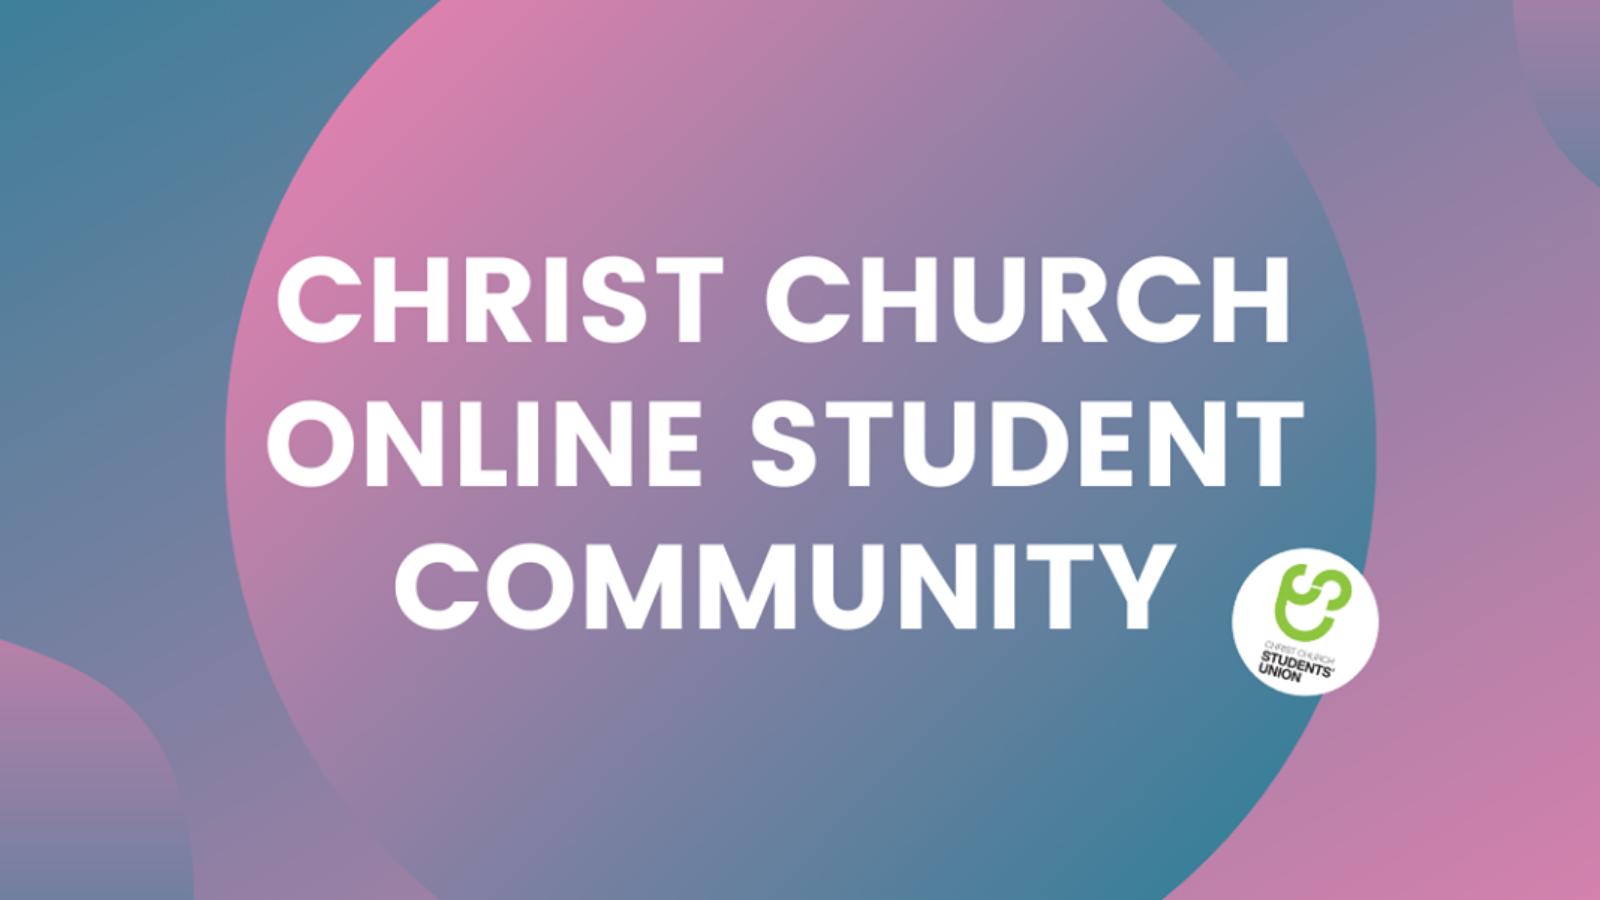 Christ Church Online student community